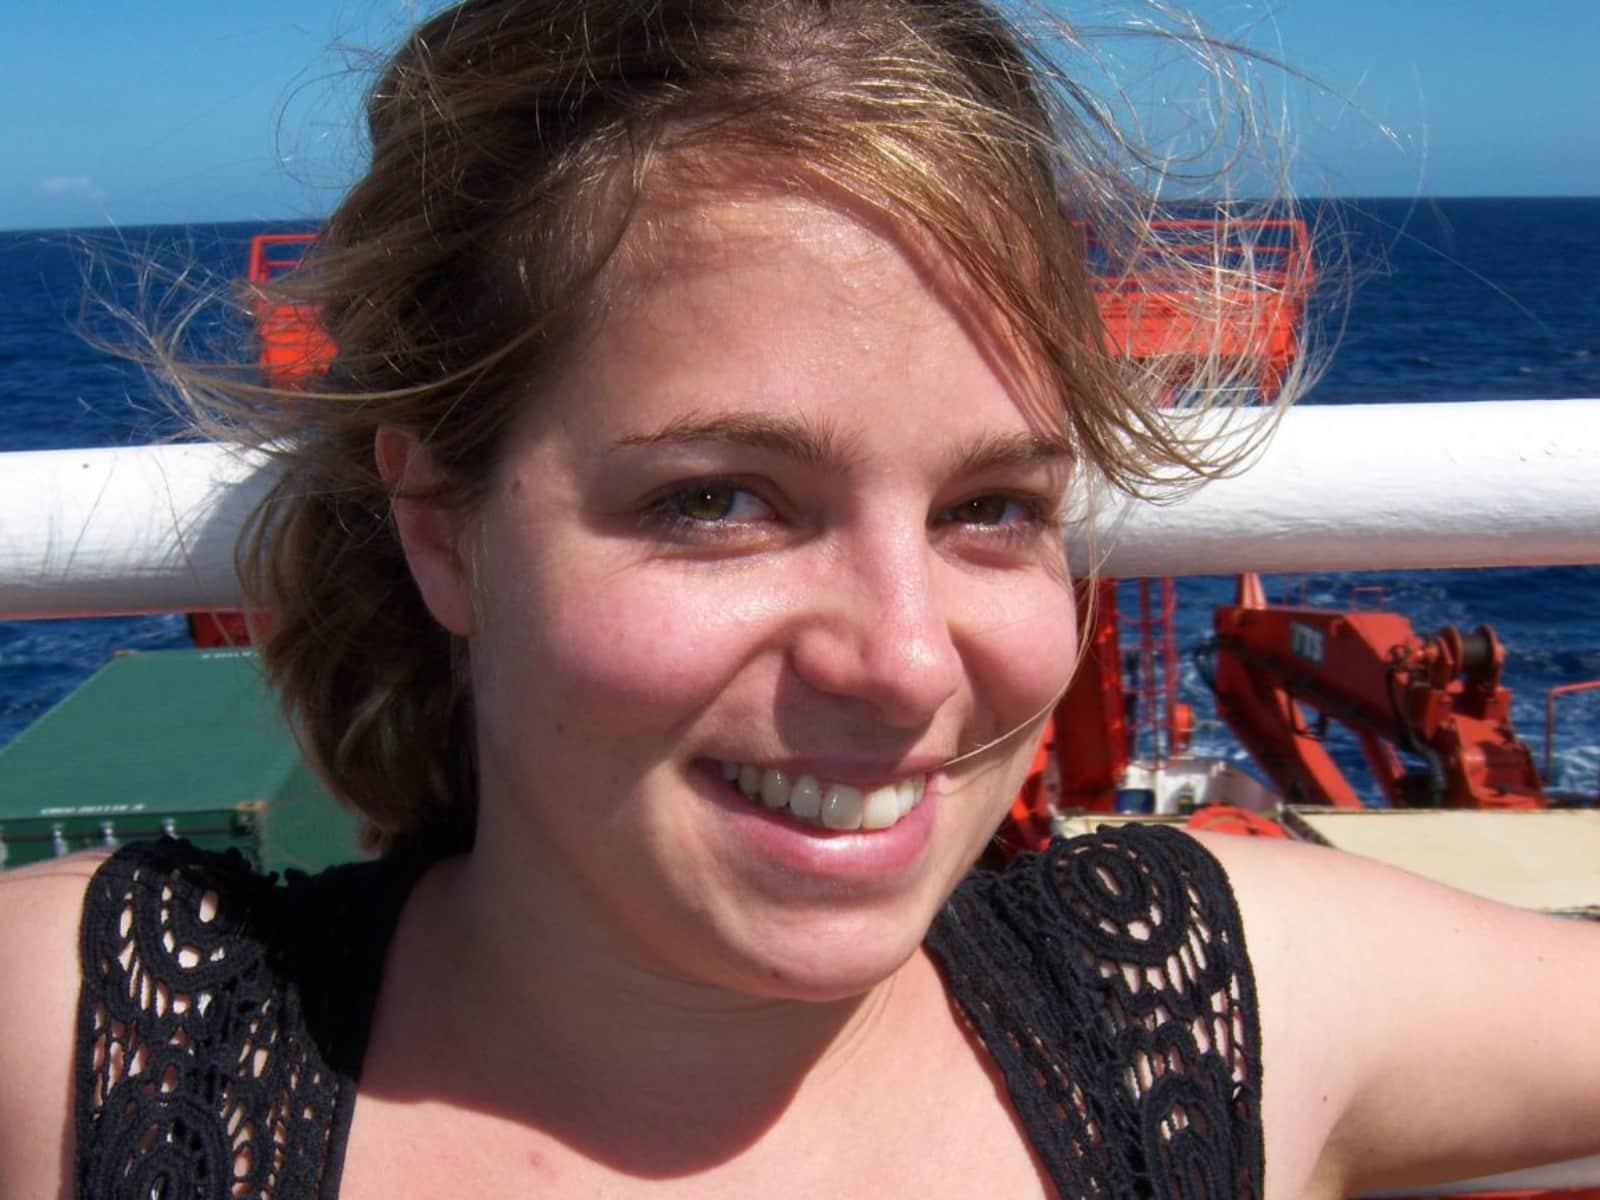 Stephanie from Coburg, Germany